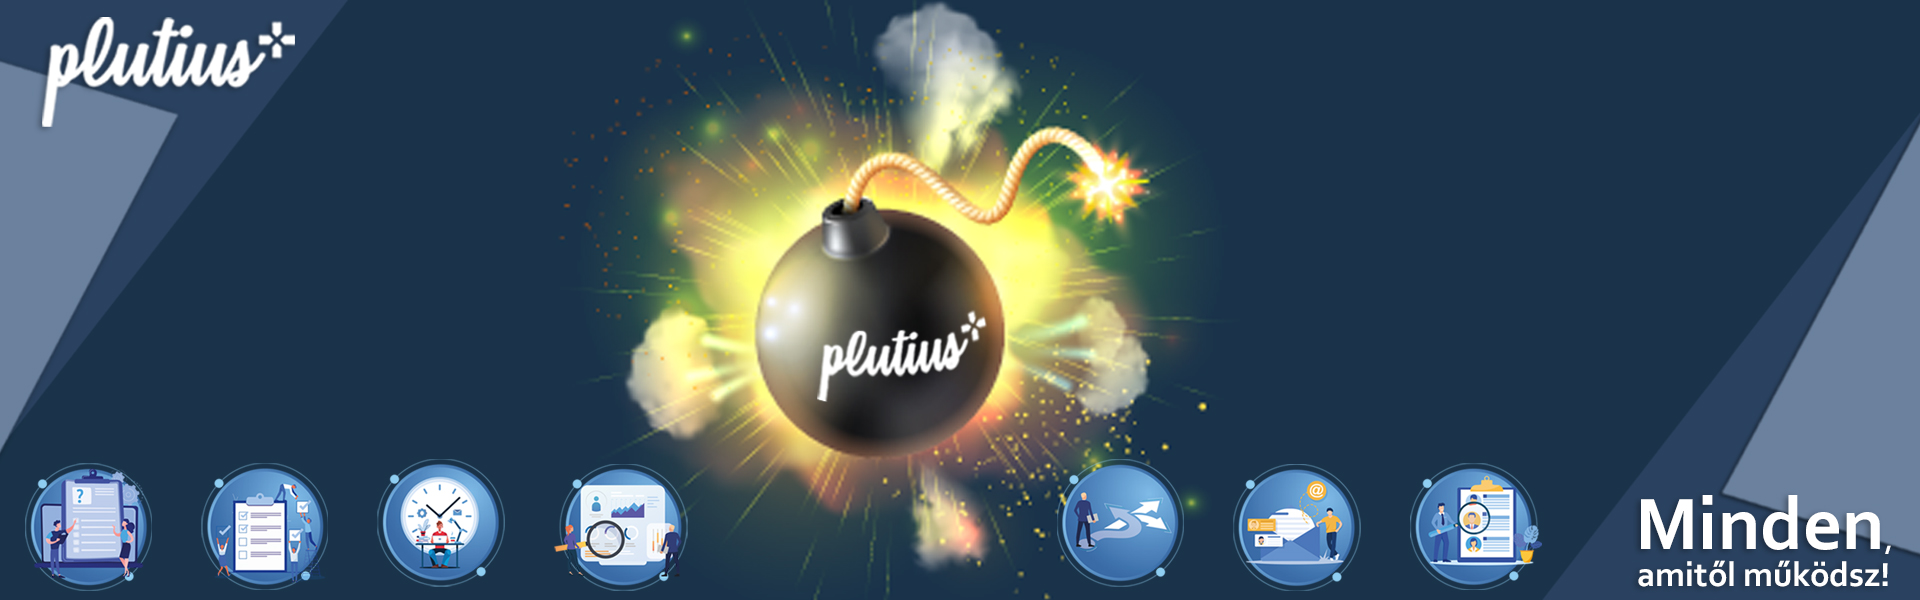 Plutius - új CRM funkciók